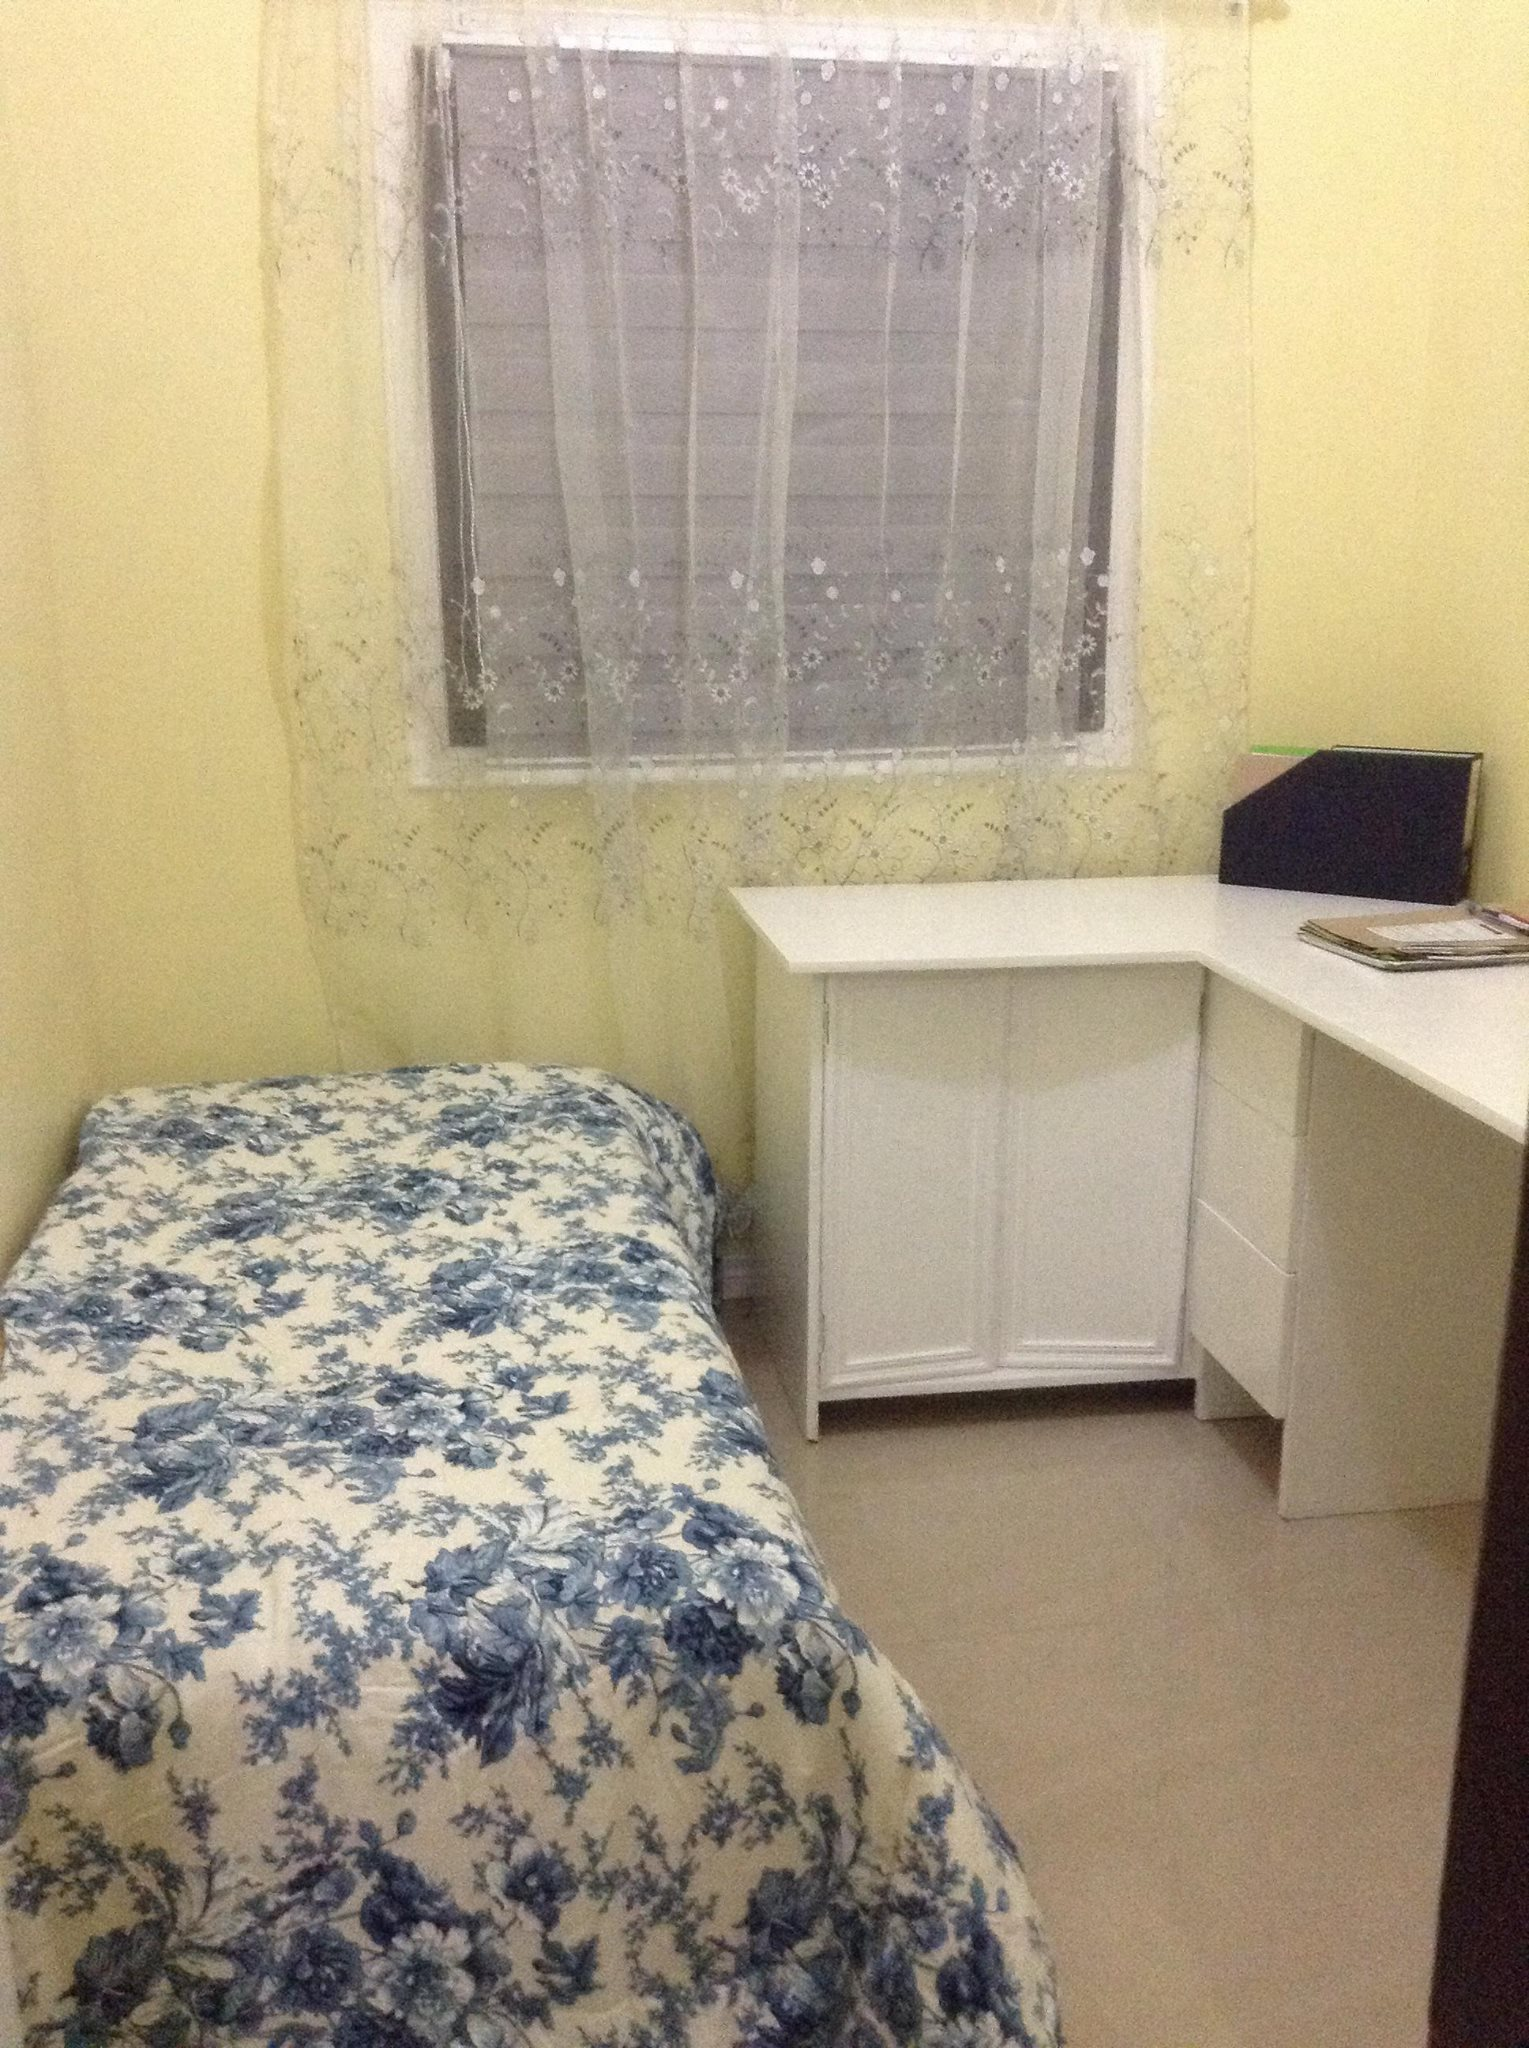 Aspen Cambridge Bedroom Set House For Assume Fully Furnished 3br In Grace Park